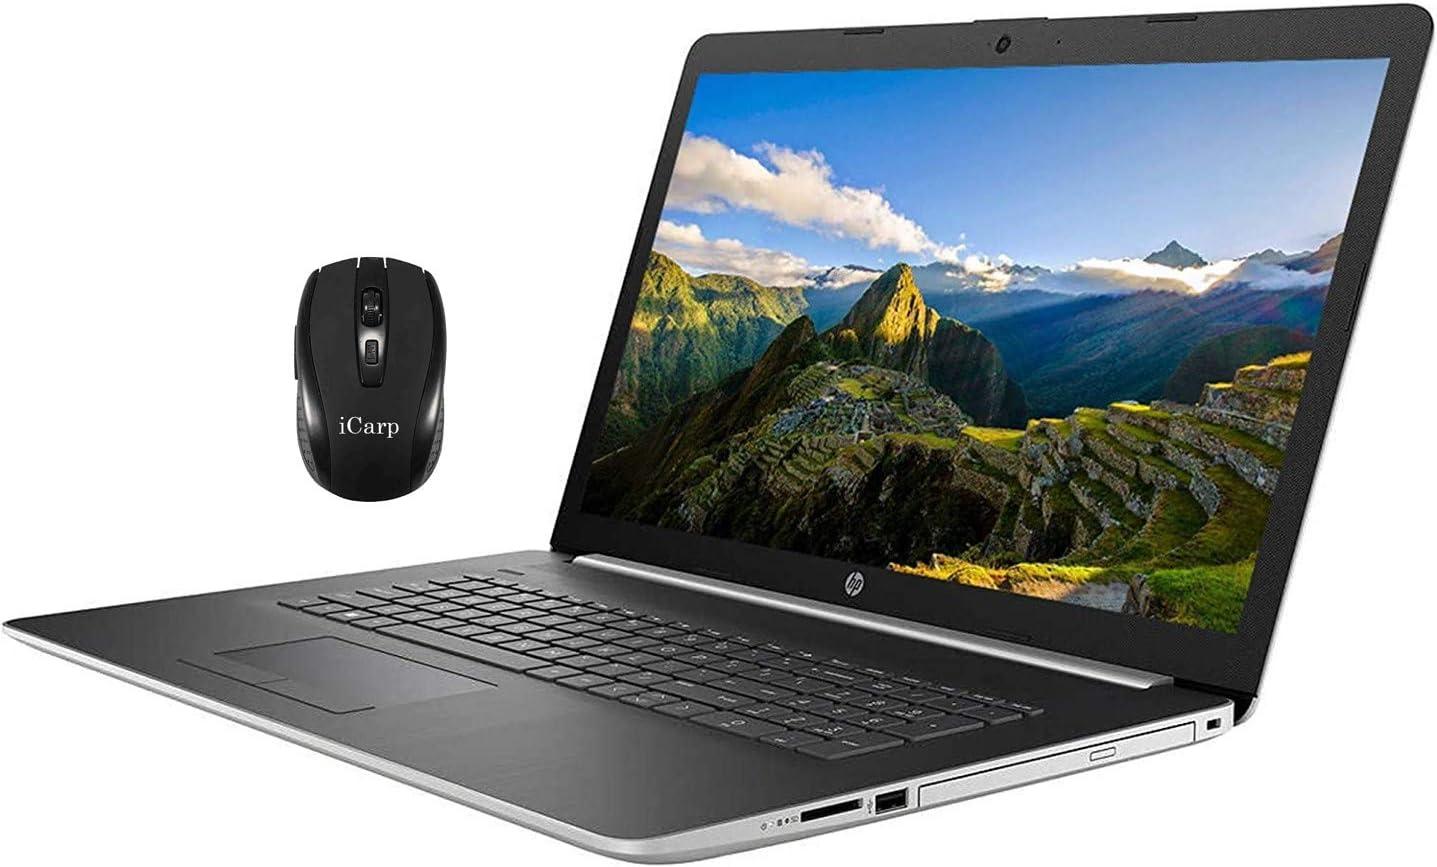 "2020 Flagship HP 17 Laptop Computer 17.3"" Full HD IPS Display 10th Gen Intel Quad-Core i5-1035G1 (Beats i7-8550U) 8GB DDR4 256GB SSD DVD Backlit KB WiFi HDMI Webcam Win 10 + iCarp Wireless Mouse"